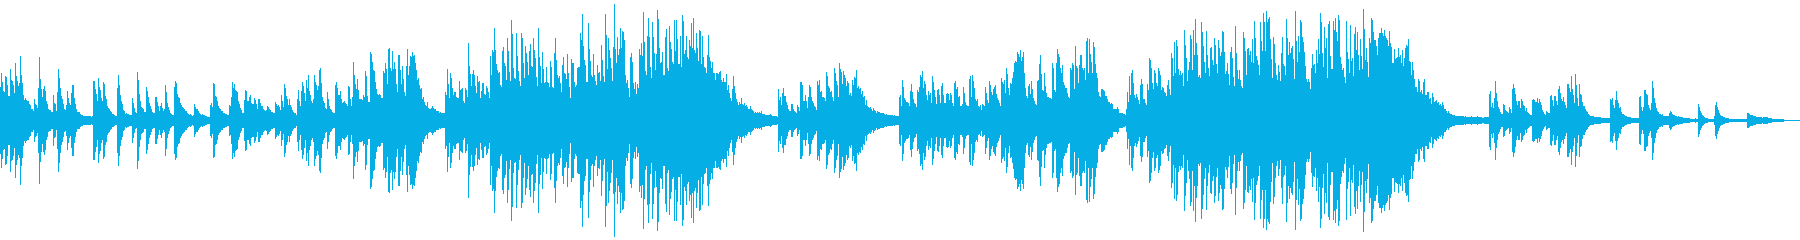 KANTピアノソロ9感動シーン系バラードの再生済みの波形